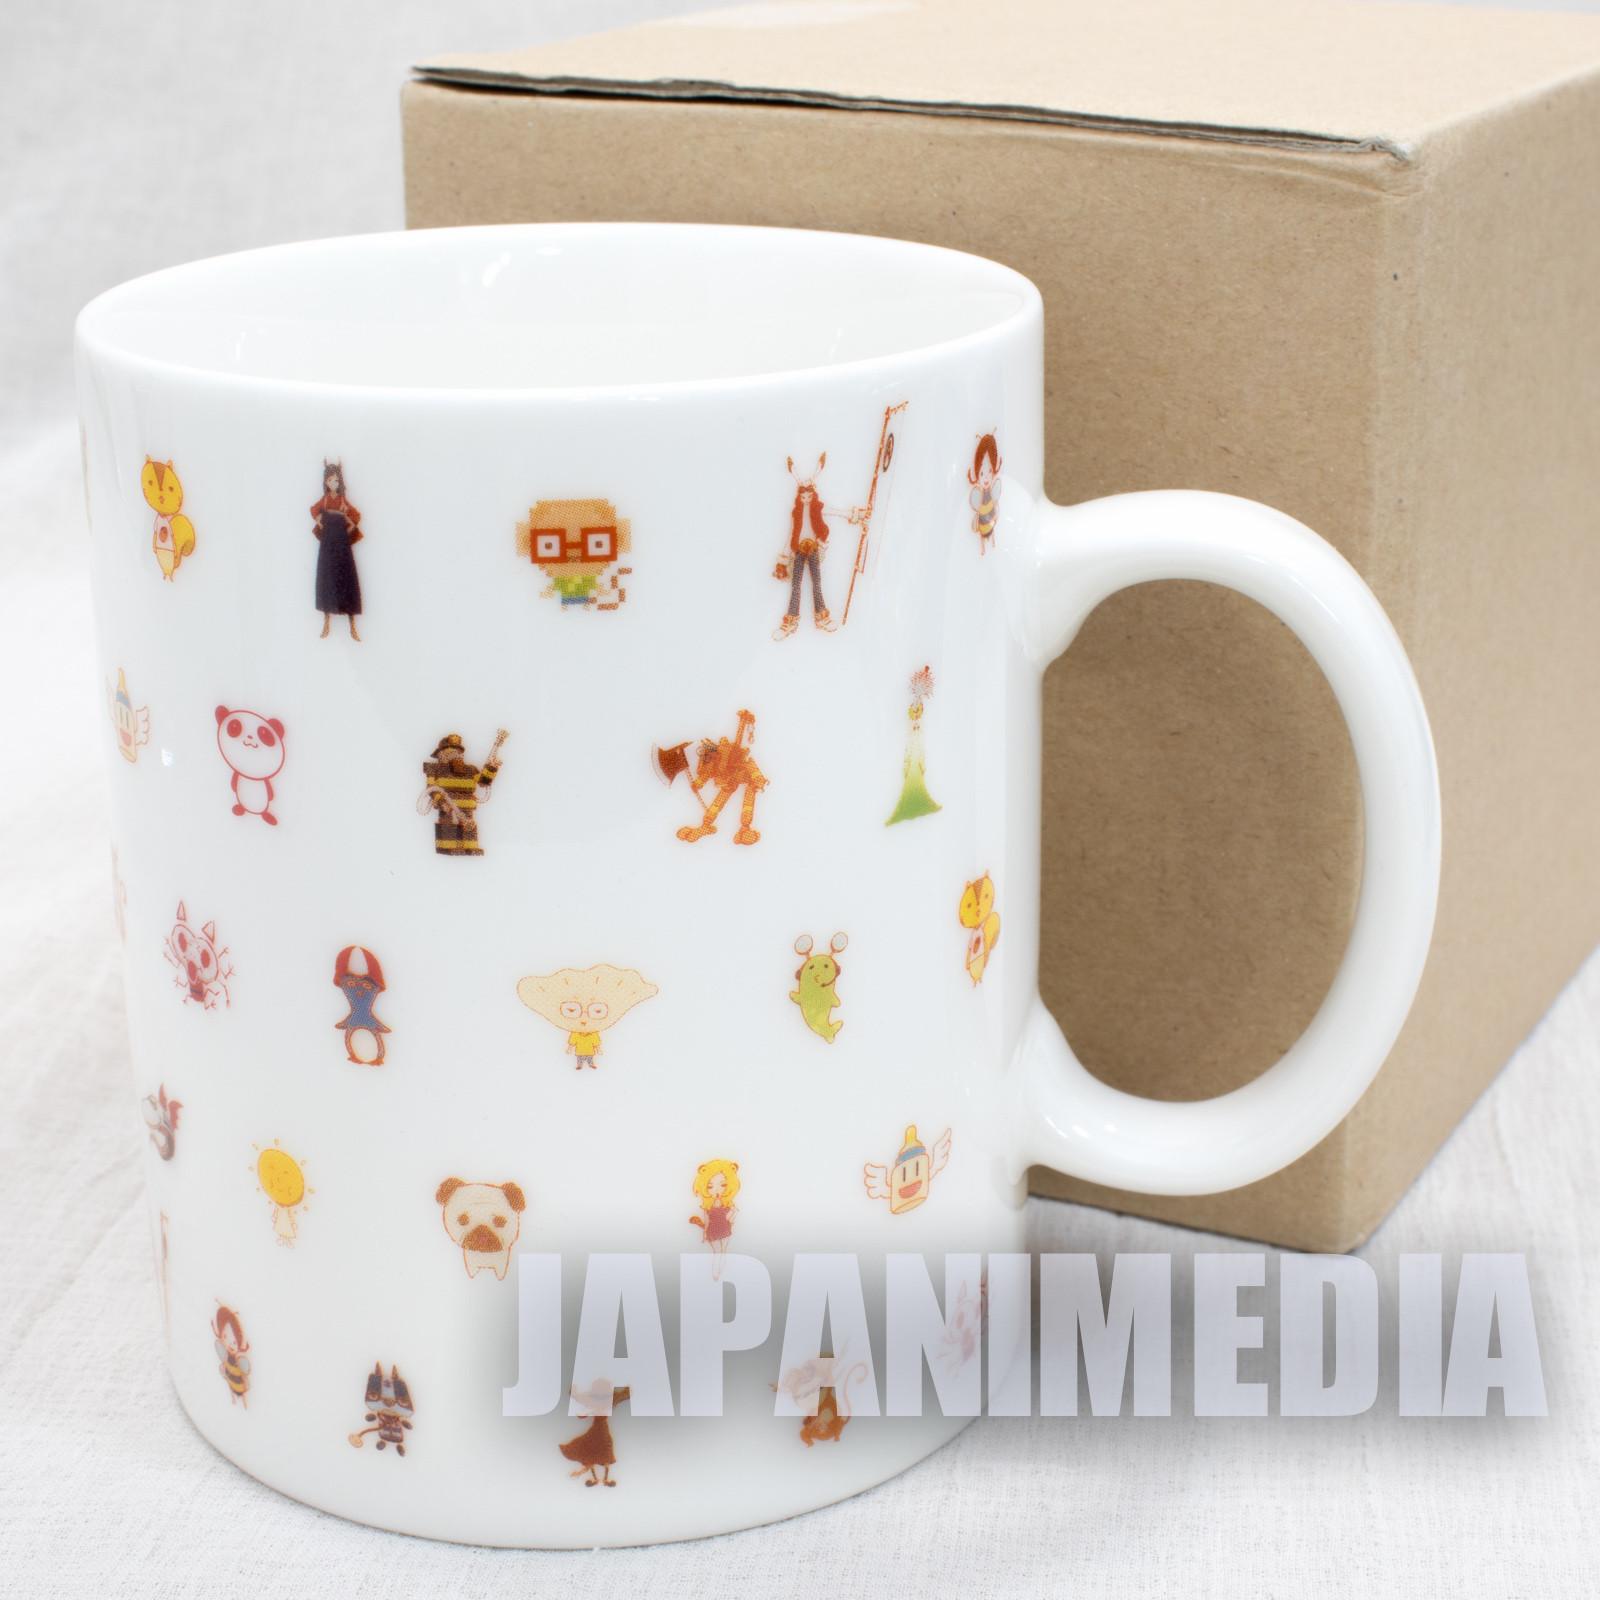 haco. x Summer Wars Big Mug Oz Avatar character's JAPAN ANIME